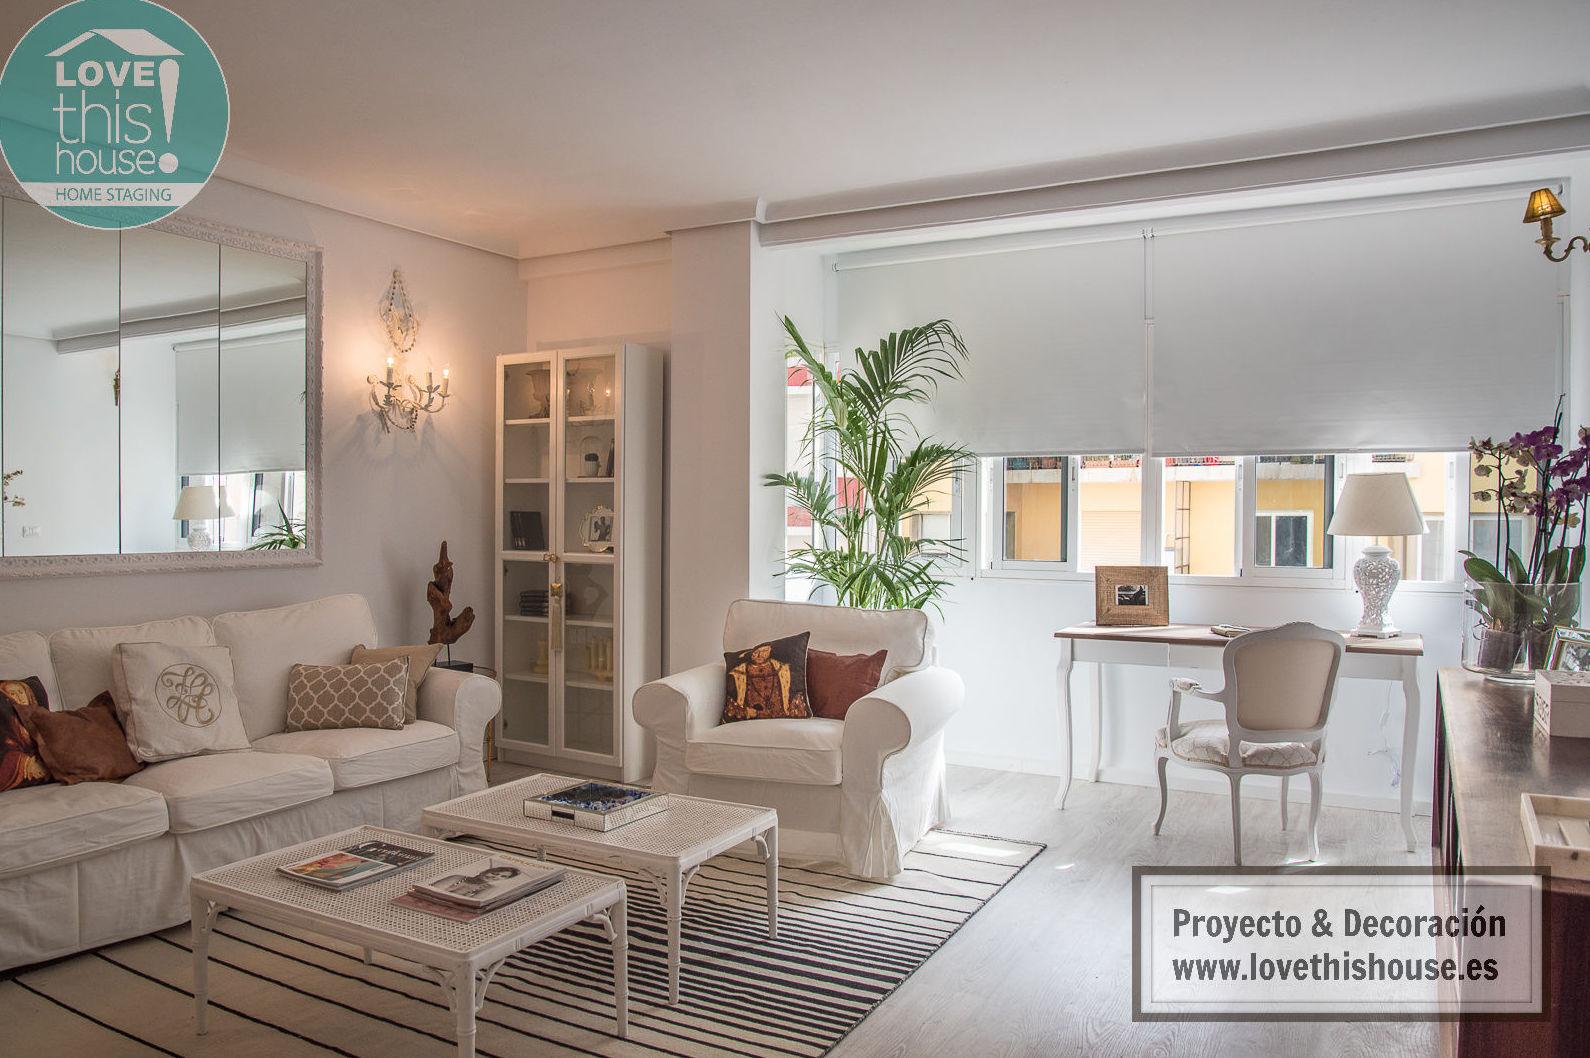 Piso de 100m reforma completa de vivienda en Santa Cruz de Tenerife